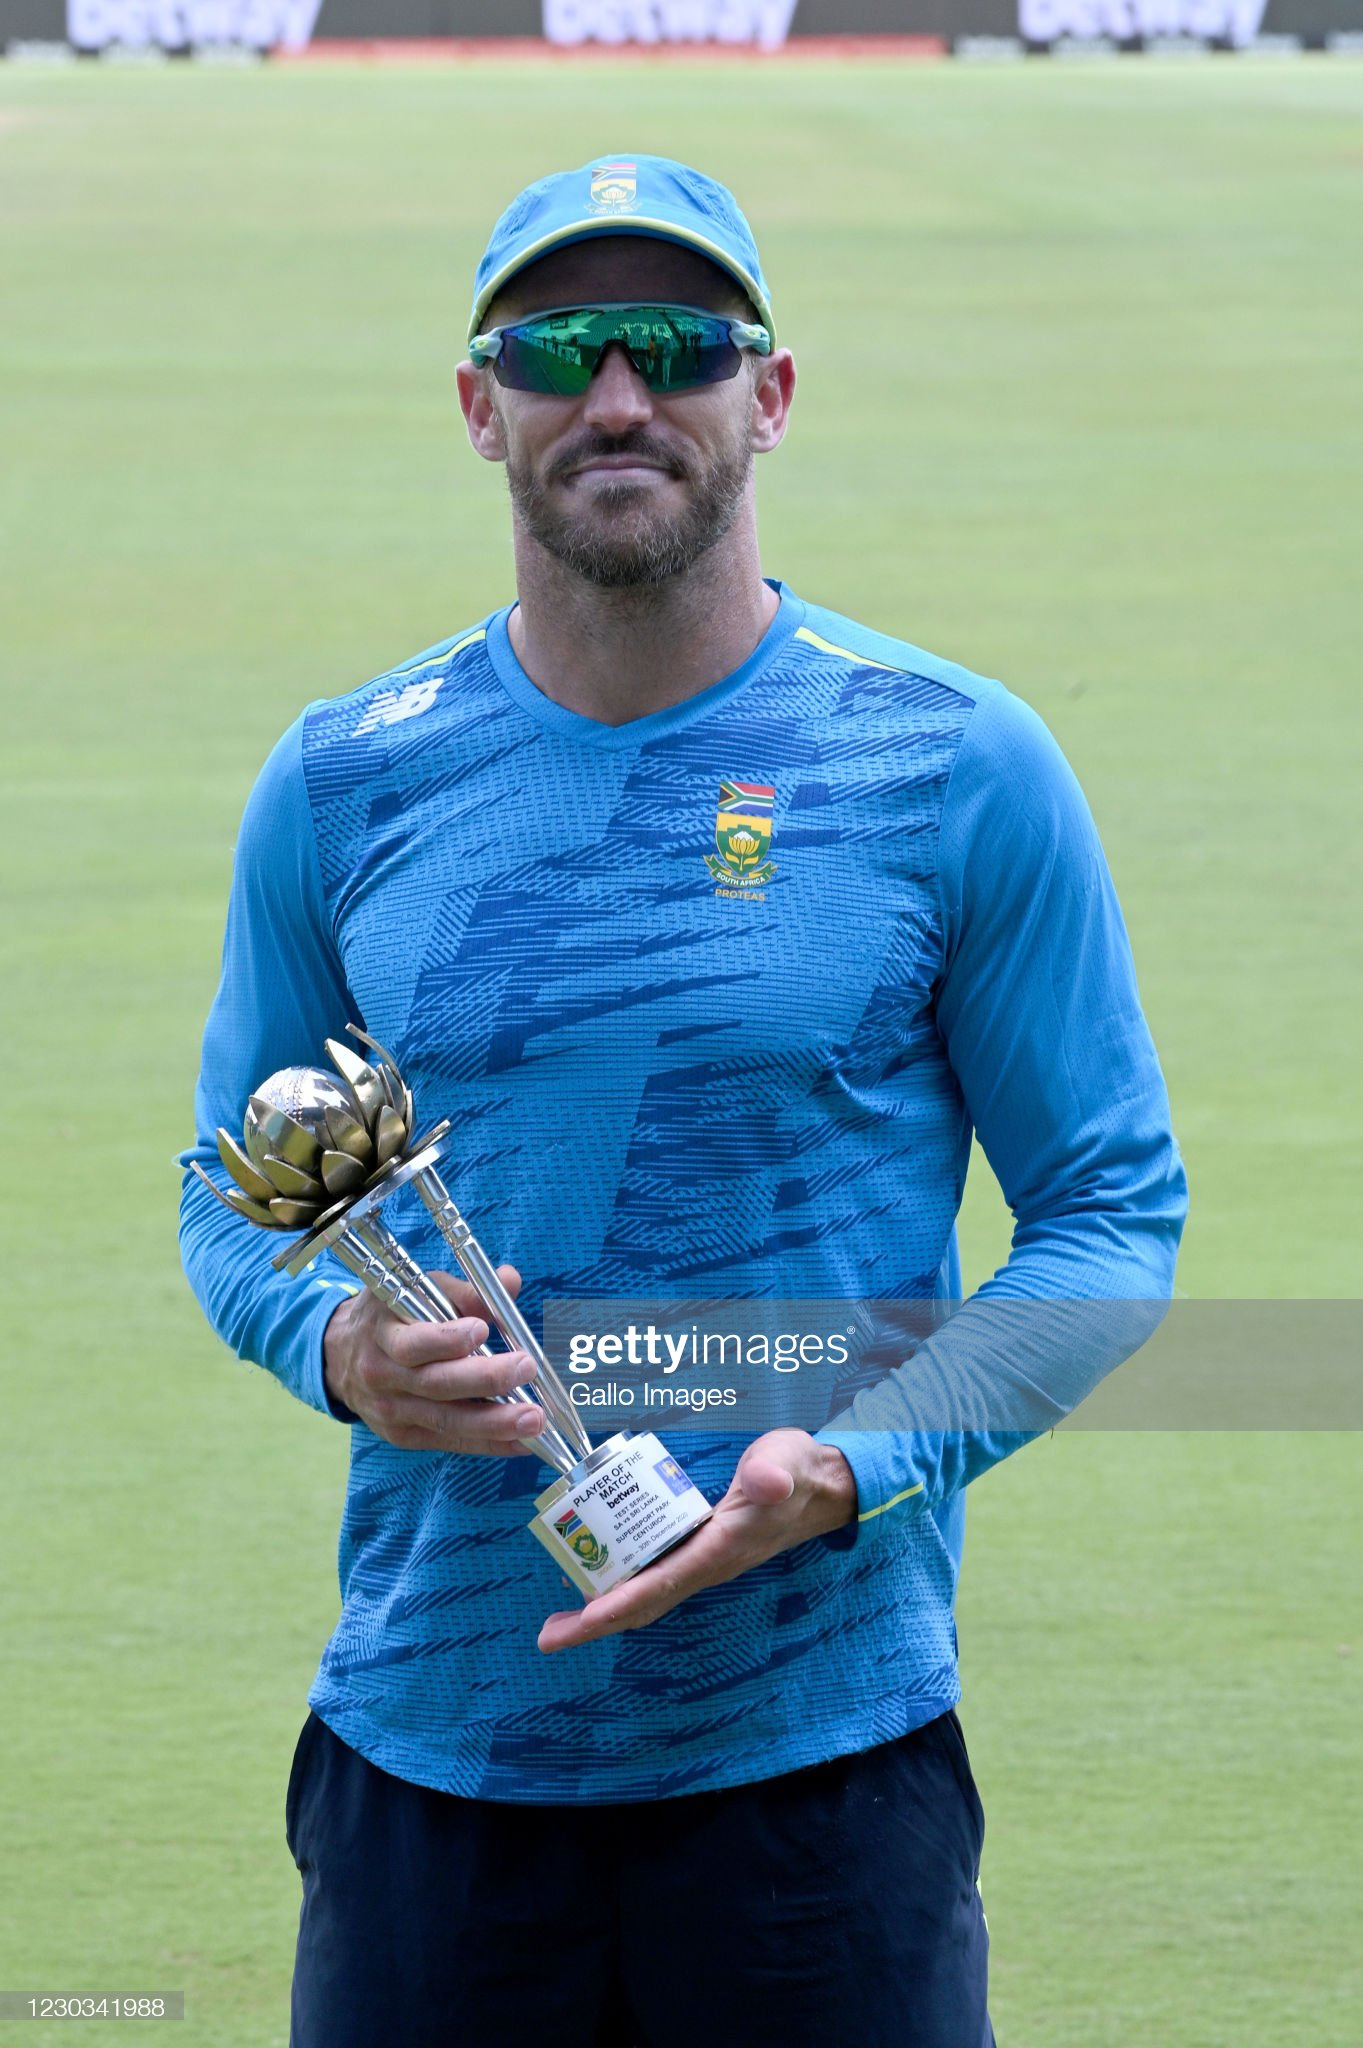 South Africa v Sri Lanka - First Test Day 4 : News Photo